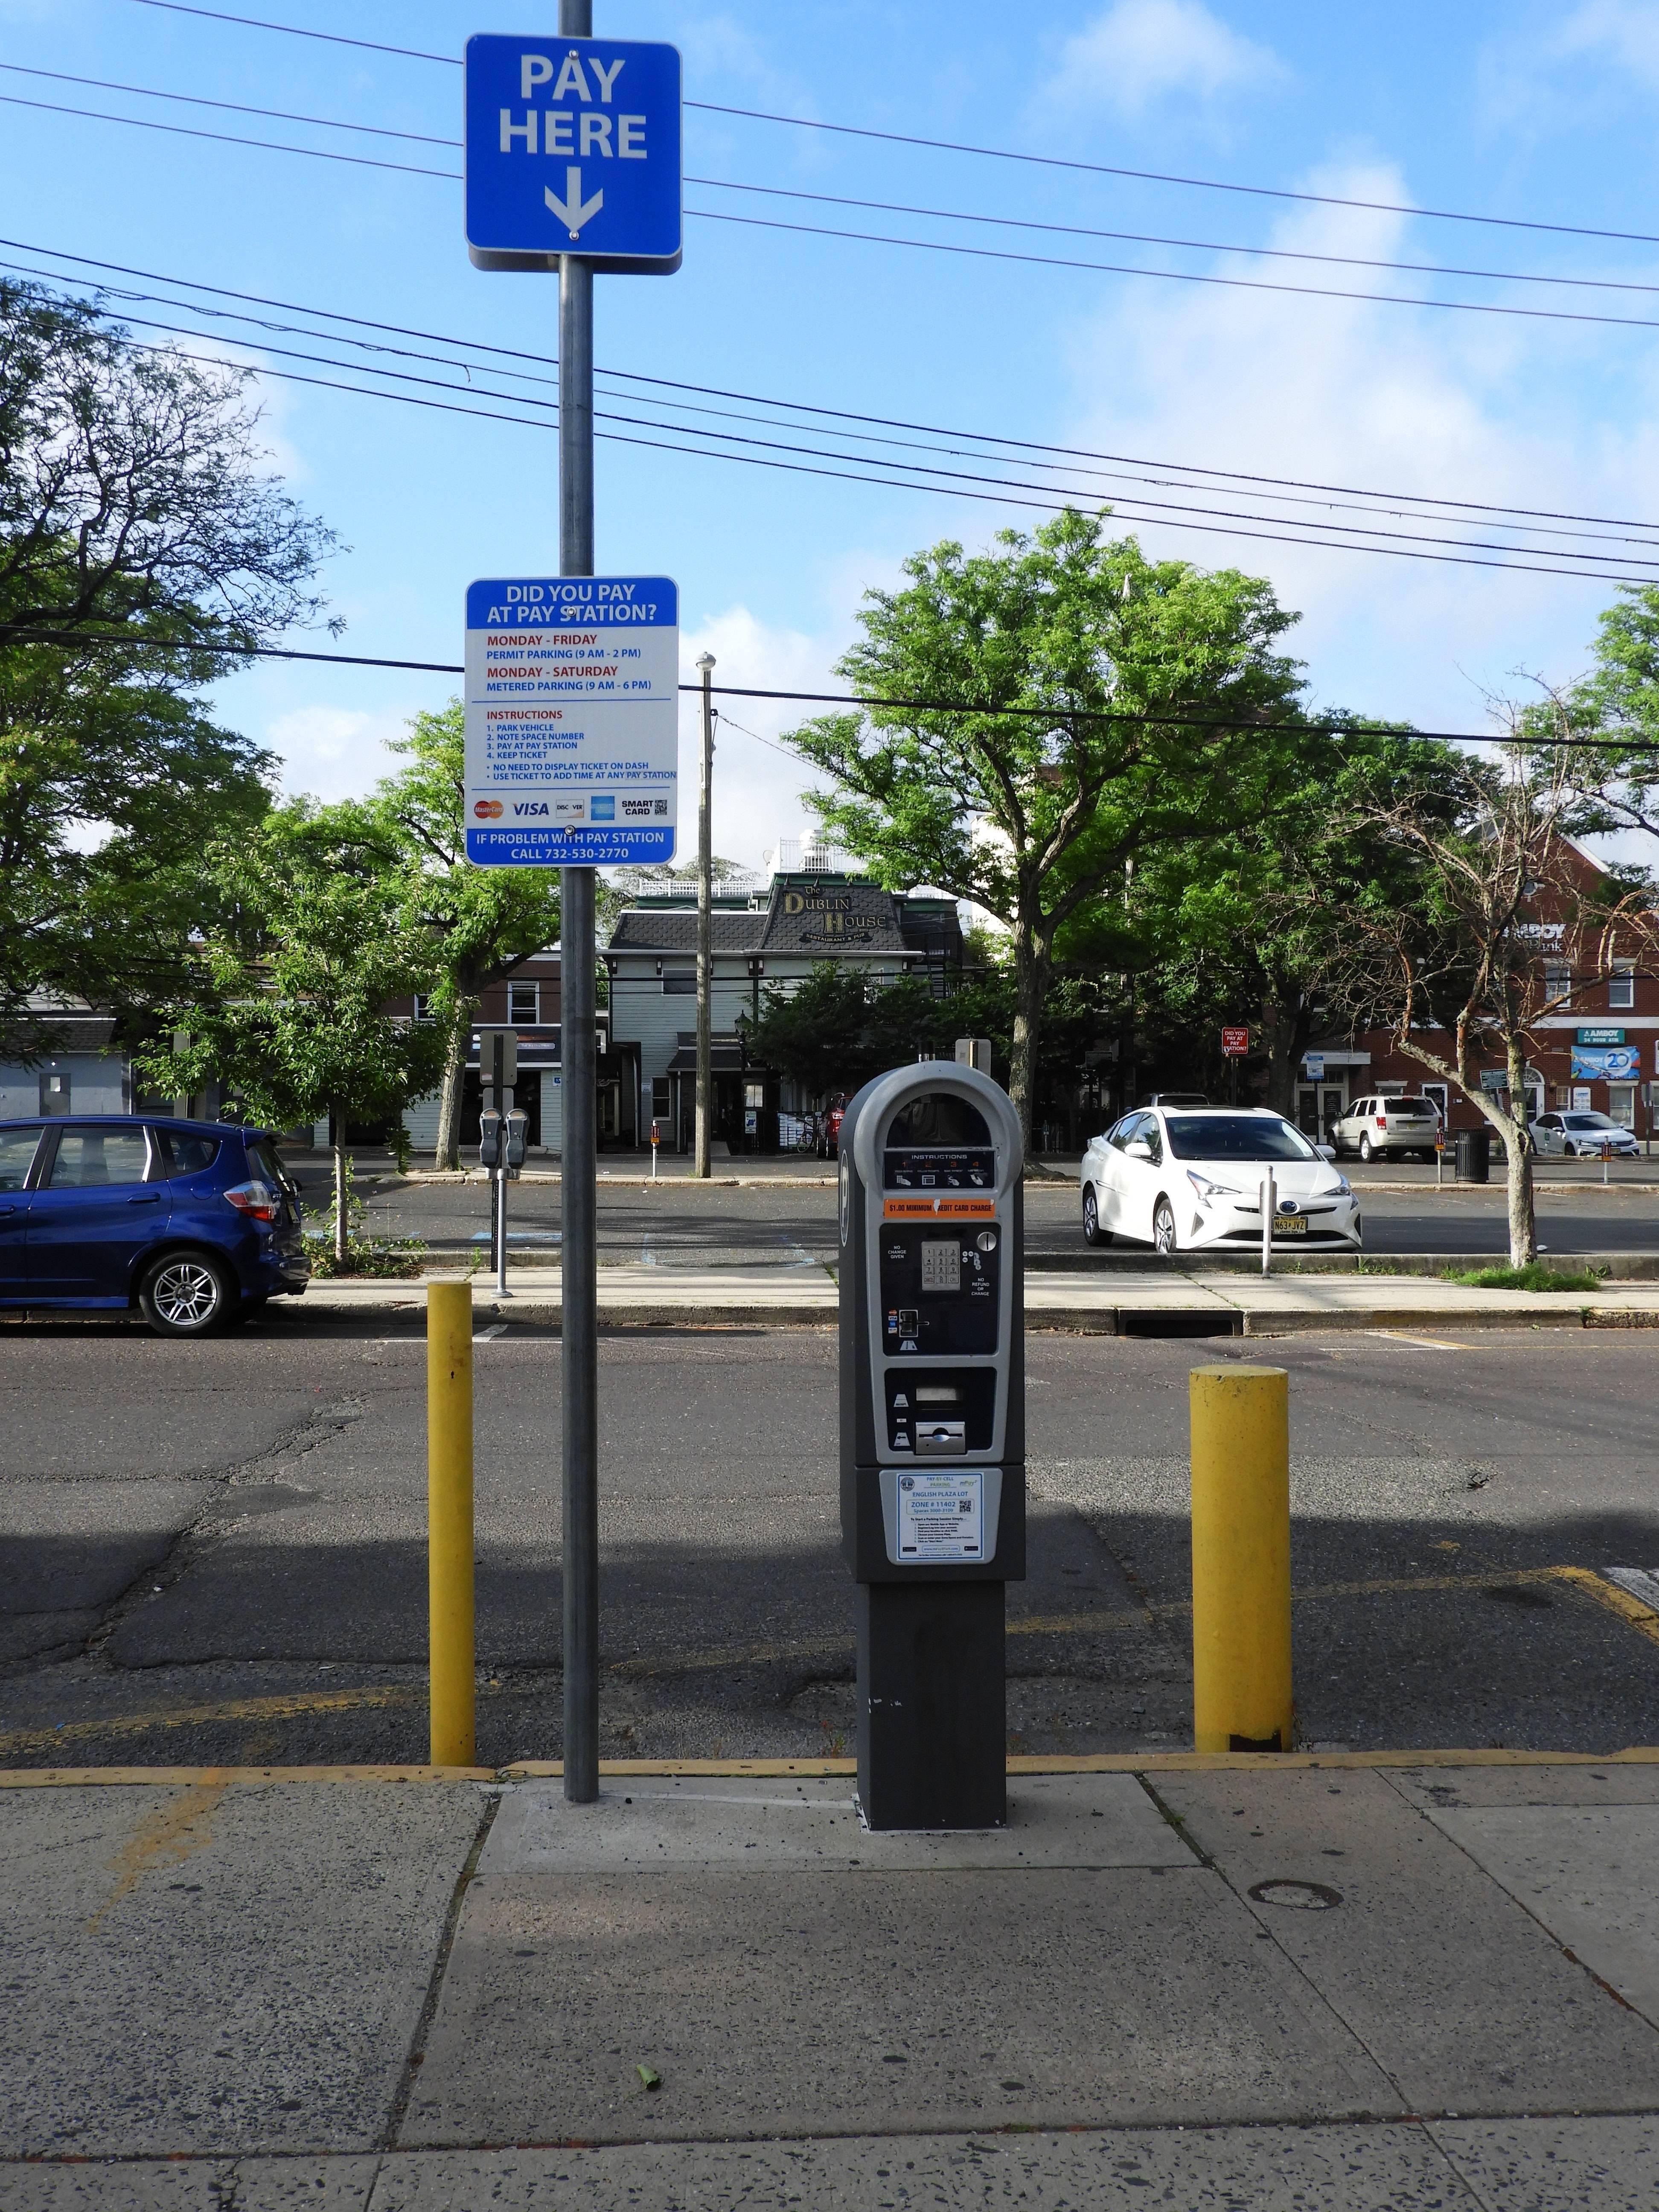 c788fa71229512f88c1e_Parking_Pay_Station.jpg